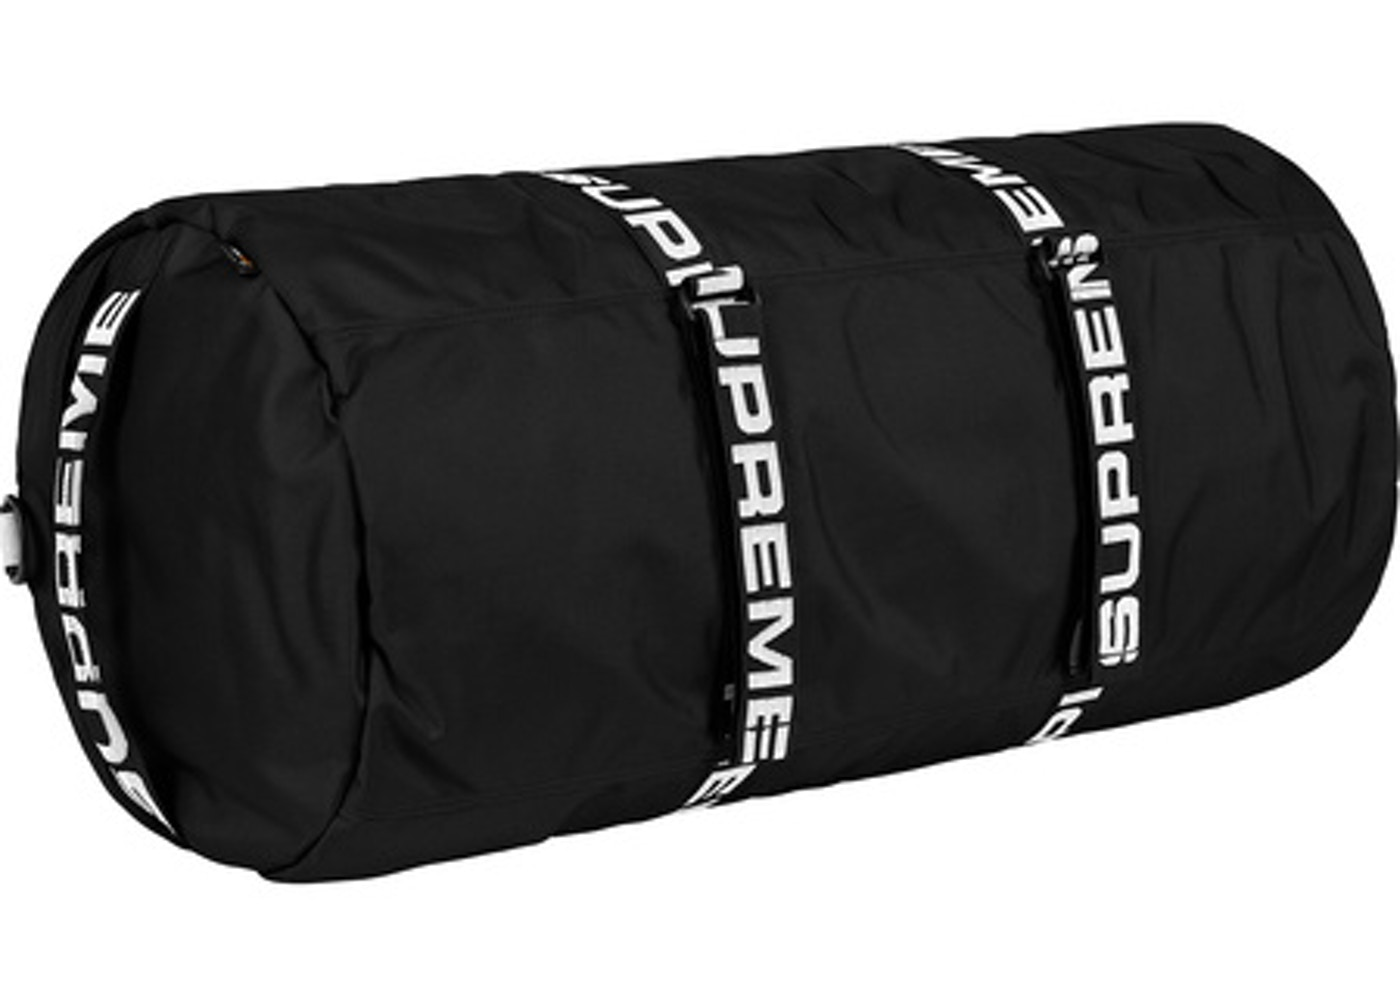 Nike Air Jordan Jumpman Trainer Duffle Gym Bag   ReGreen Springfield d7b8d27069